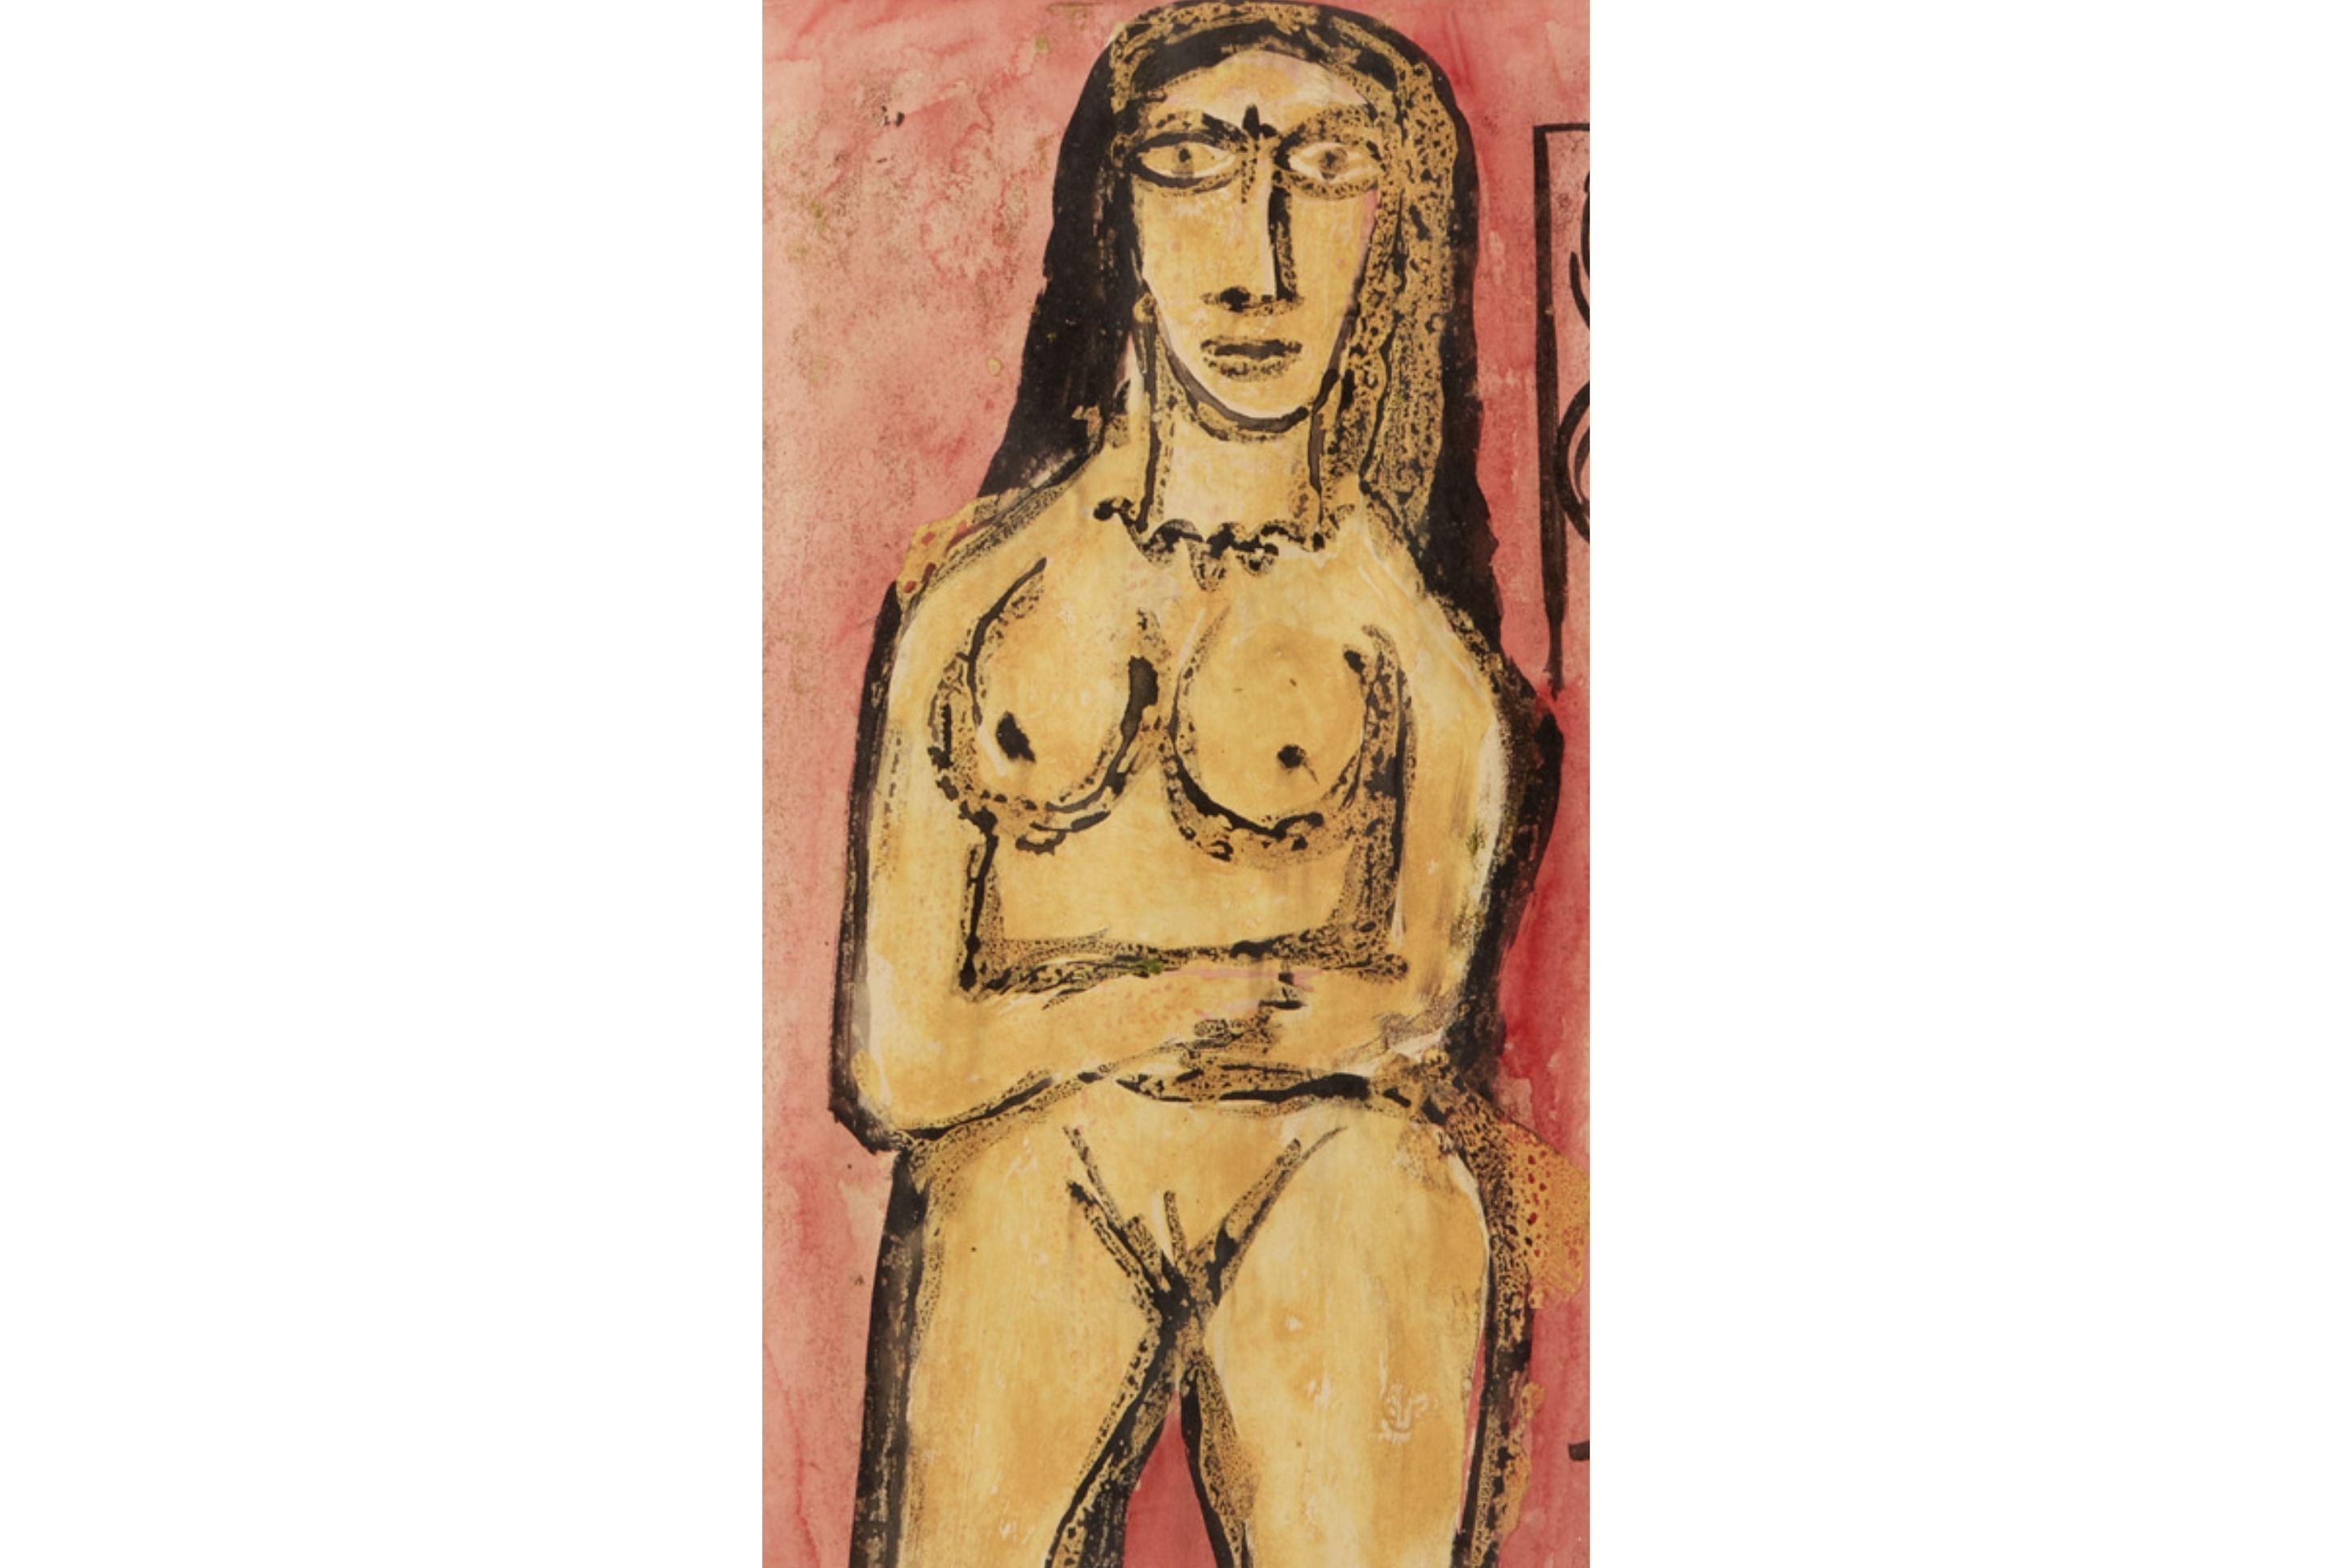 FRANCIS NEWTON SOUZA (INDIAN, 1924-2002) - FEMALE NUDE